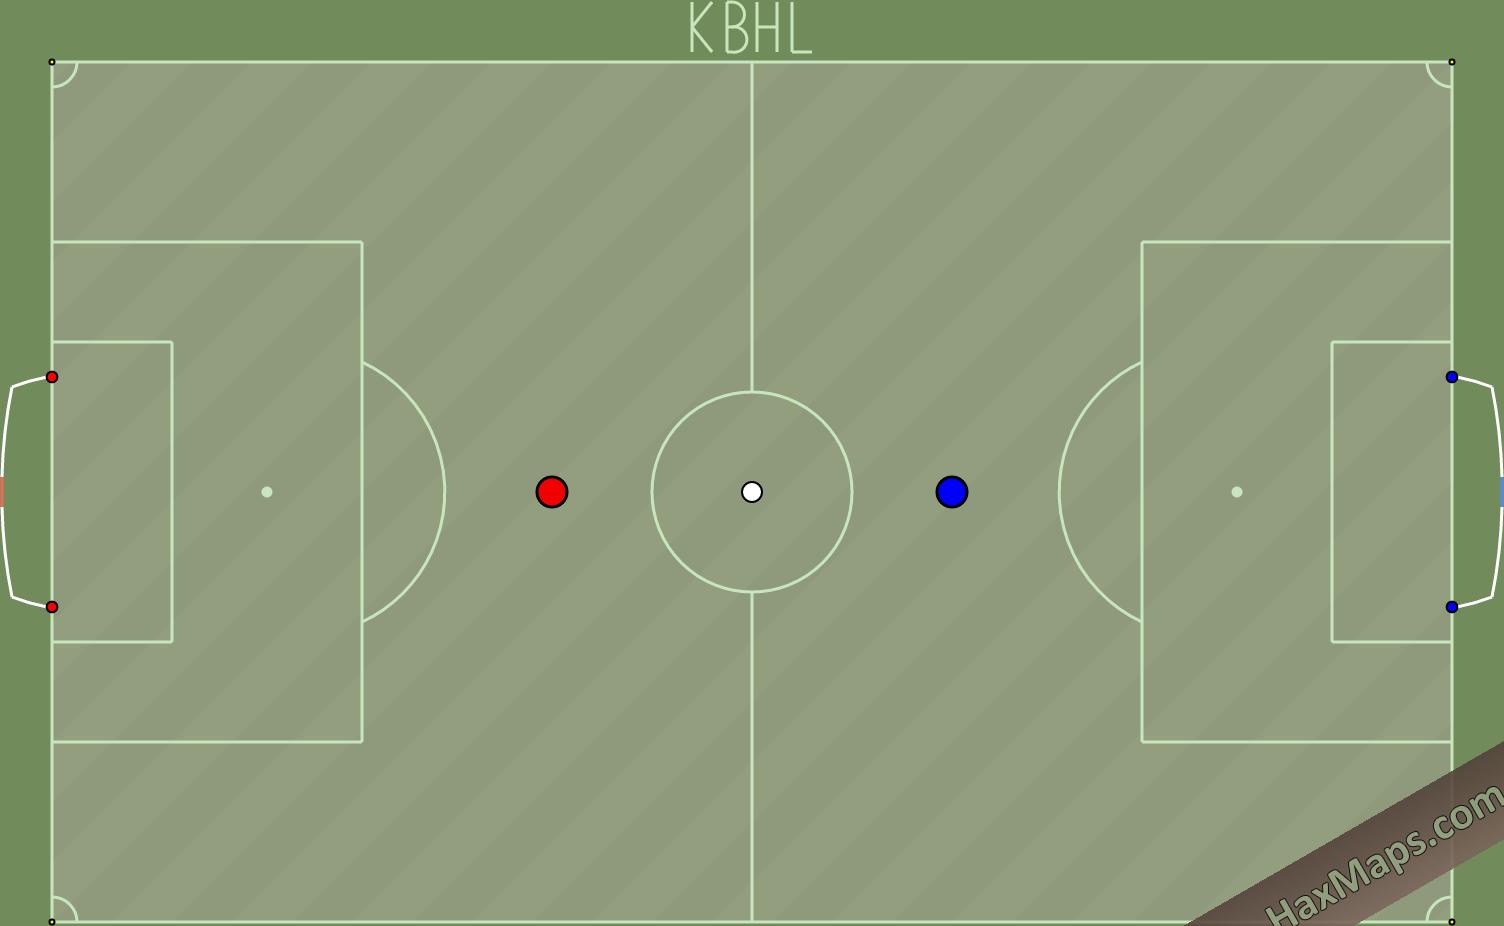 hax ball maps | Koreaball Liga Haxball